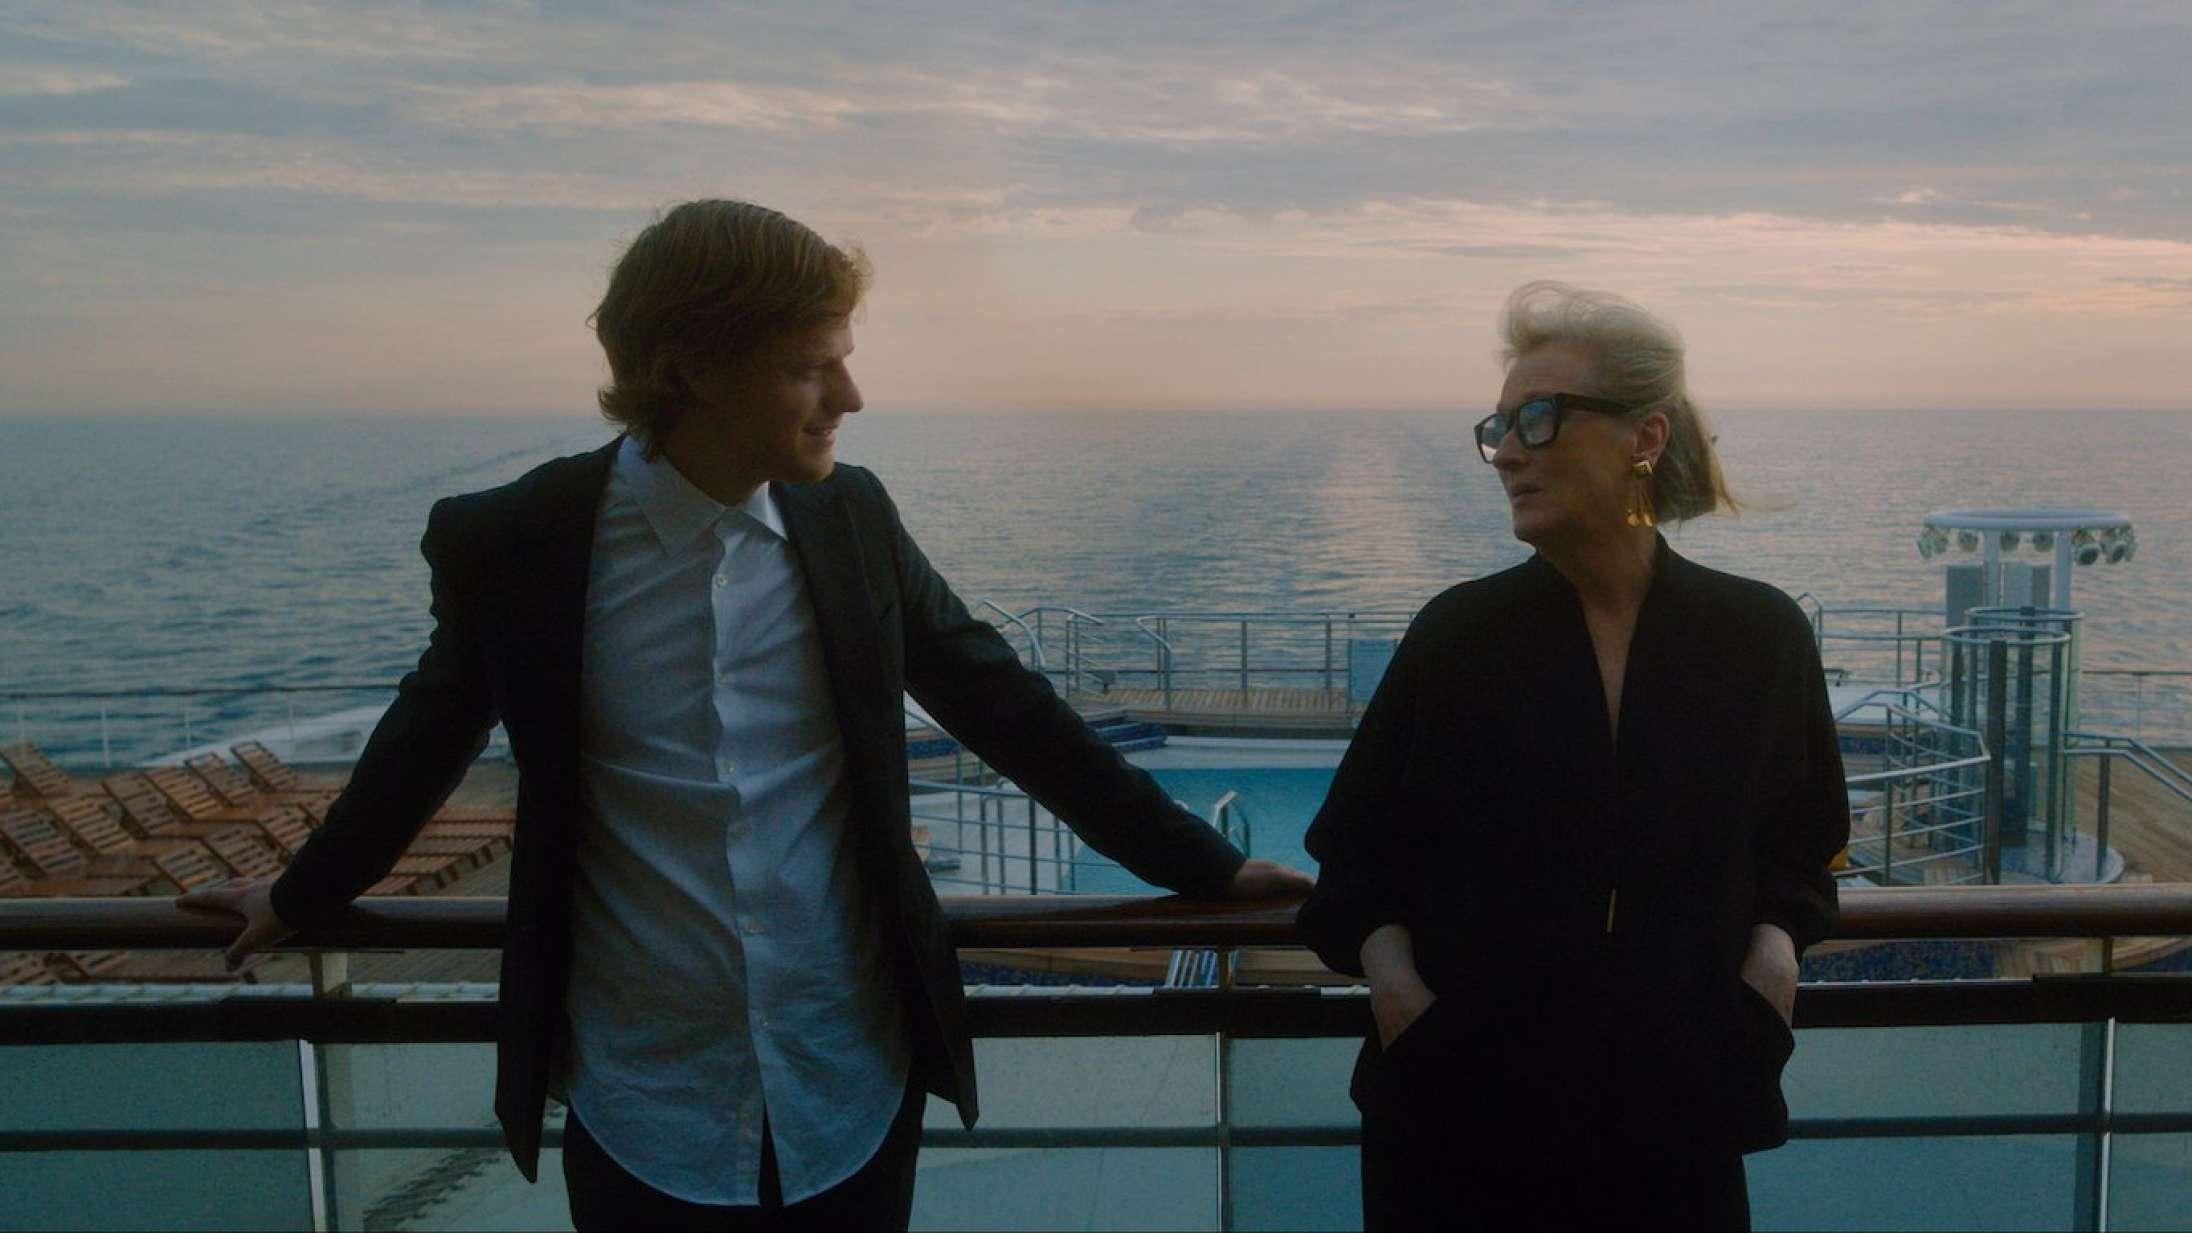 'Let Them All Talk': Meryl Streep er groft uudnyttet i indiemesters nyeste eksperiment